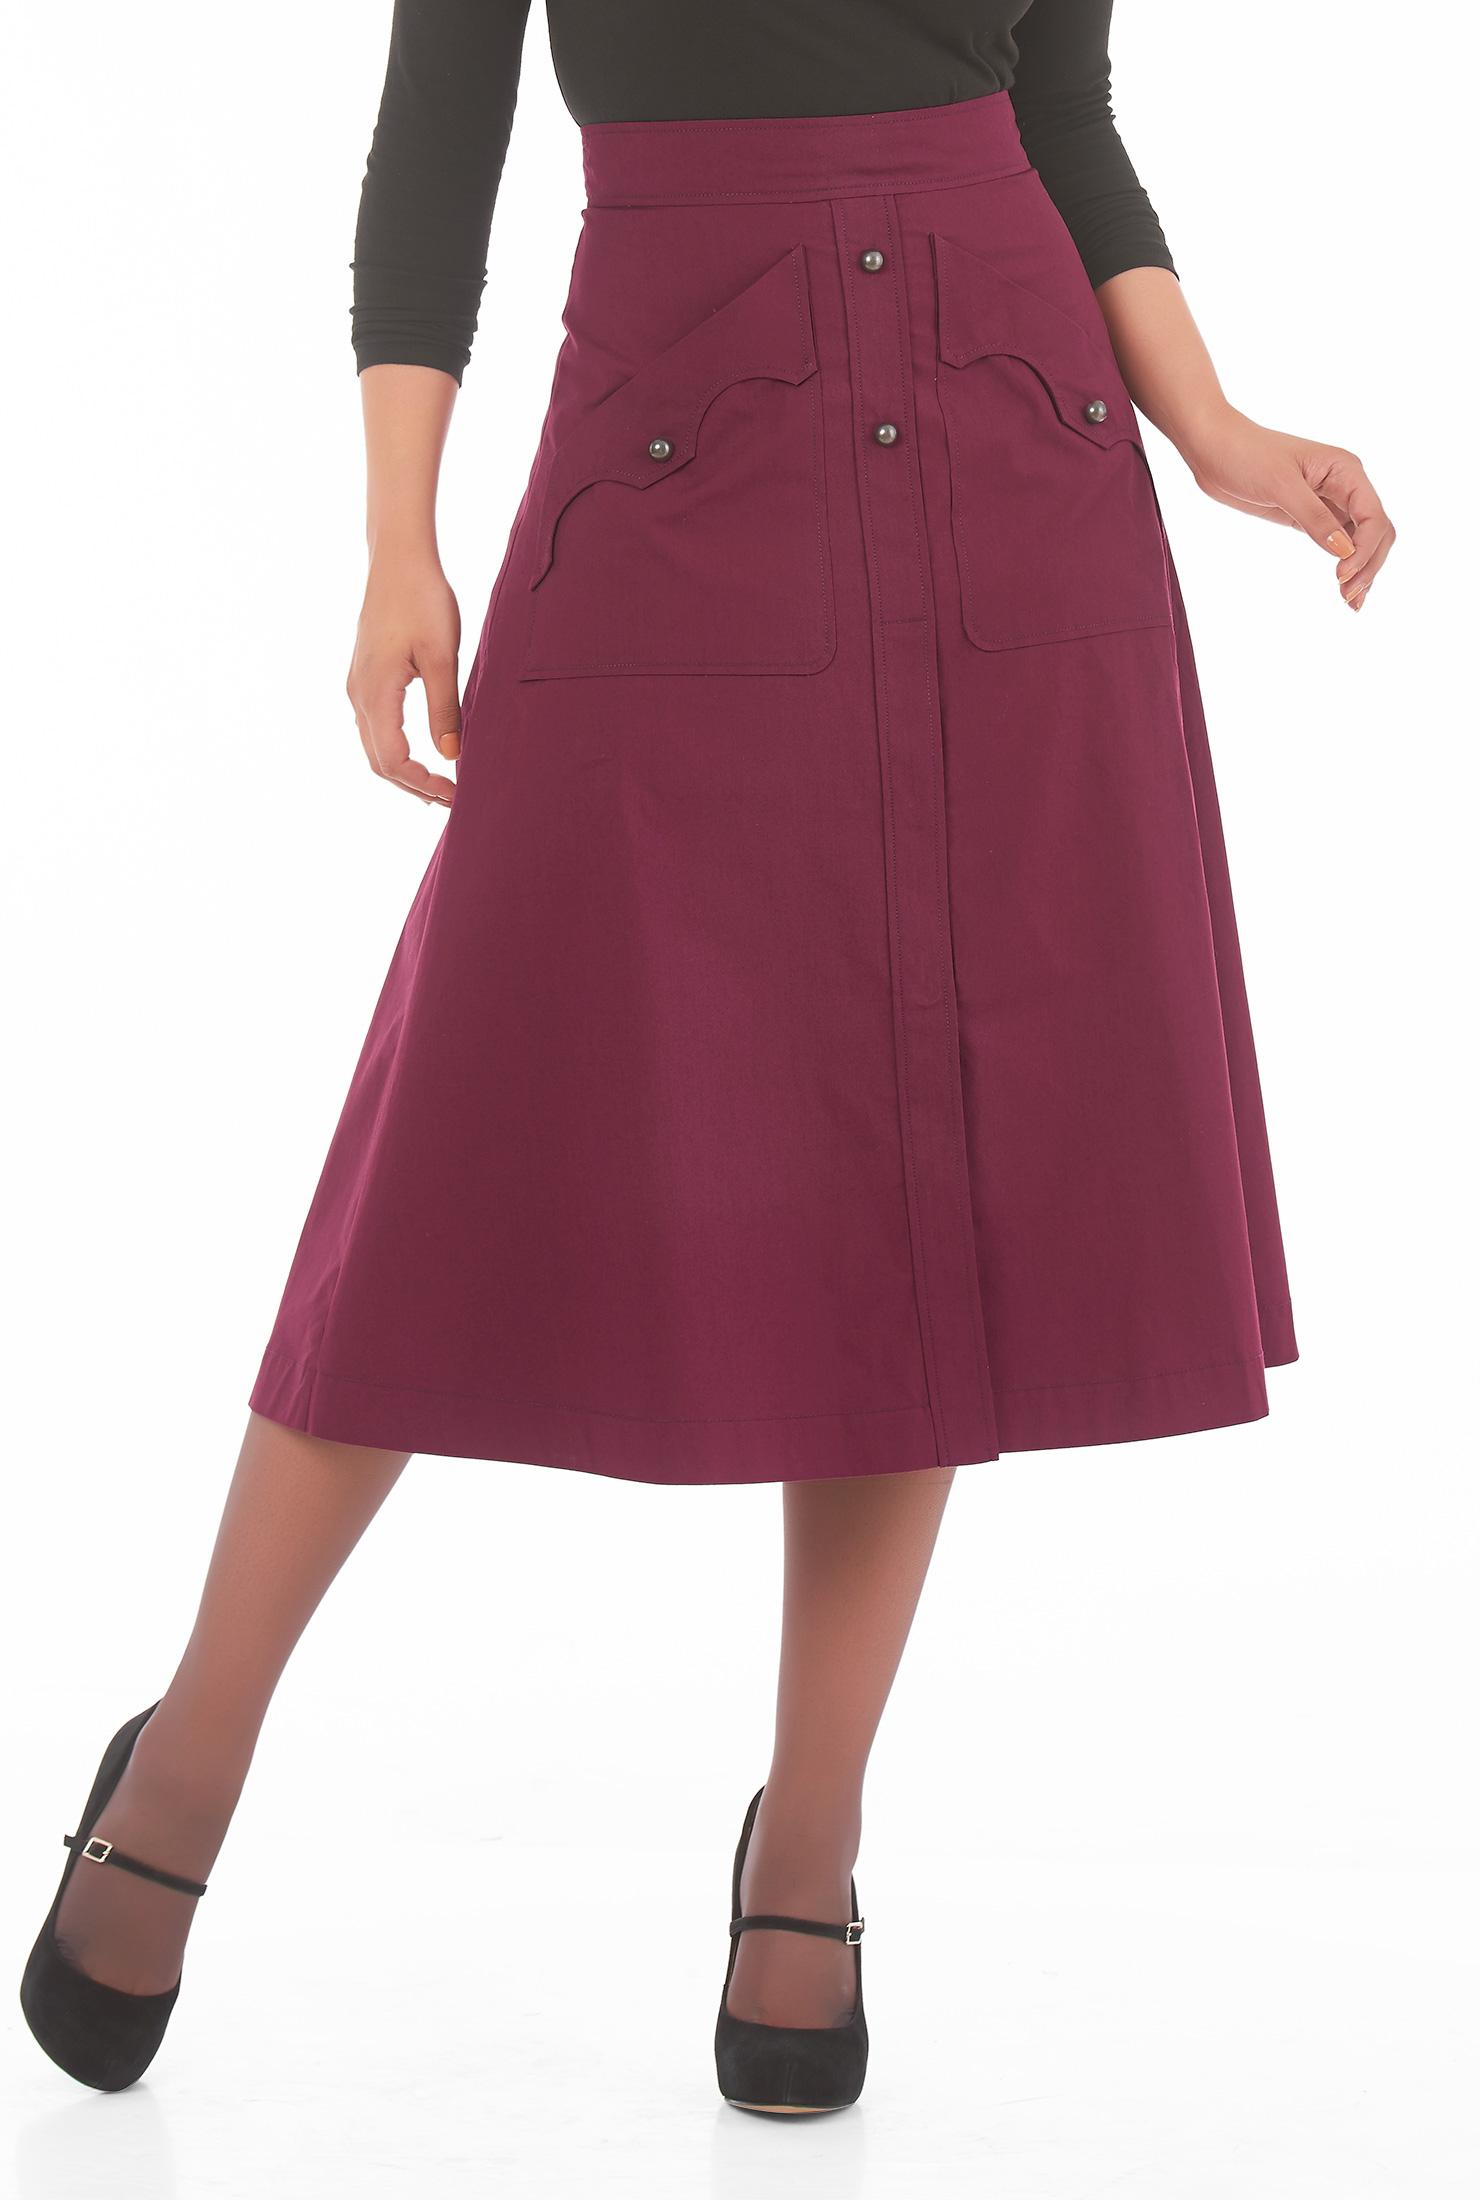 Plus Size Western Skirts And Dresses | Saddha